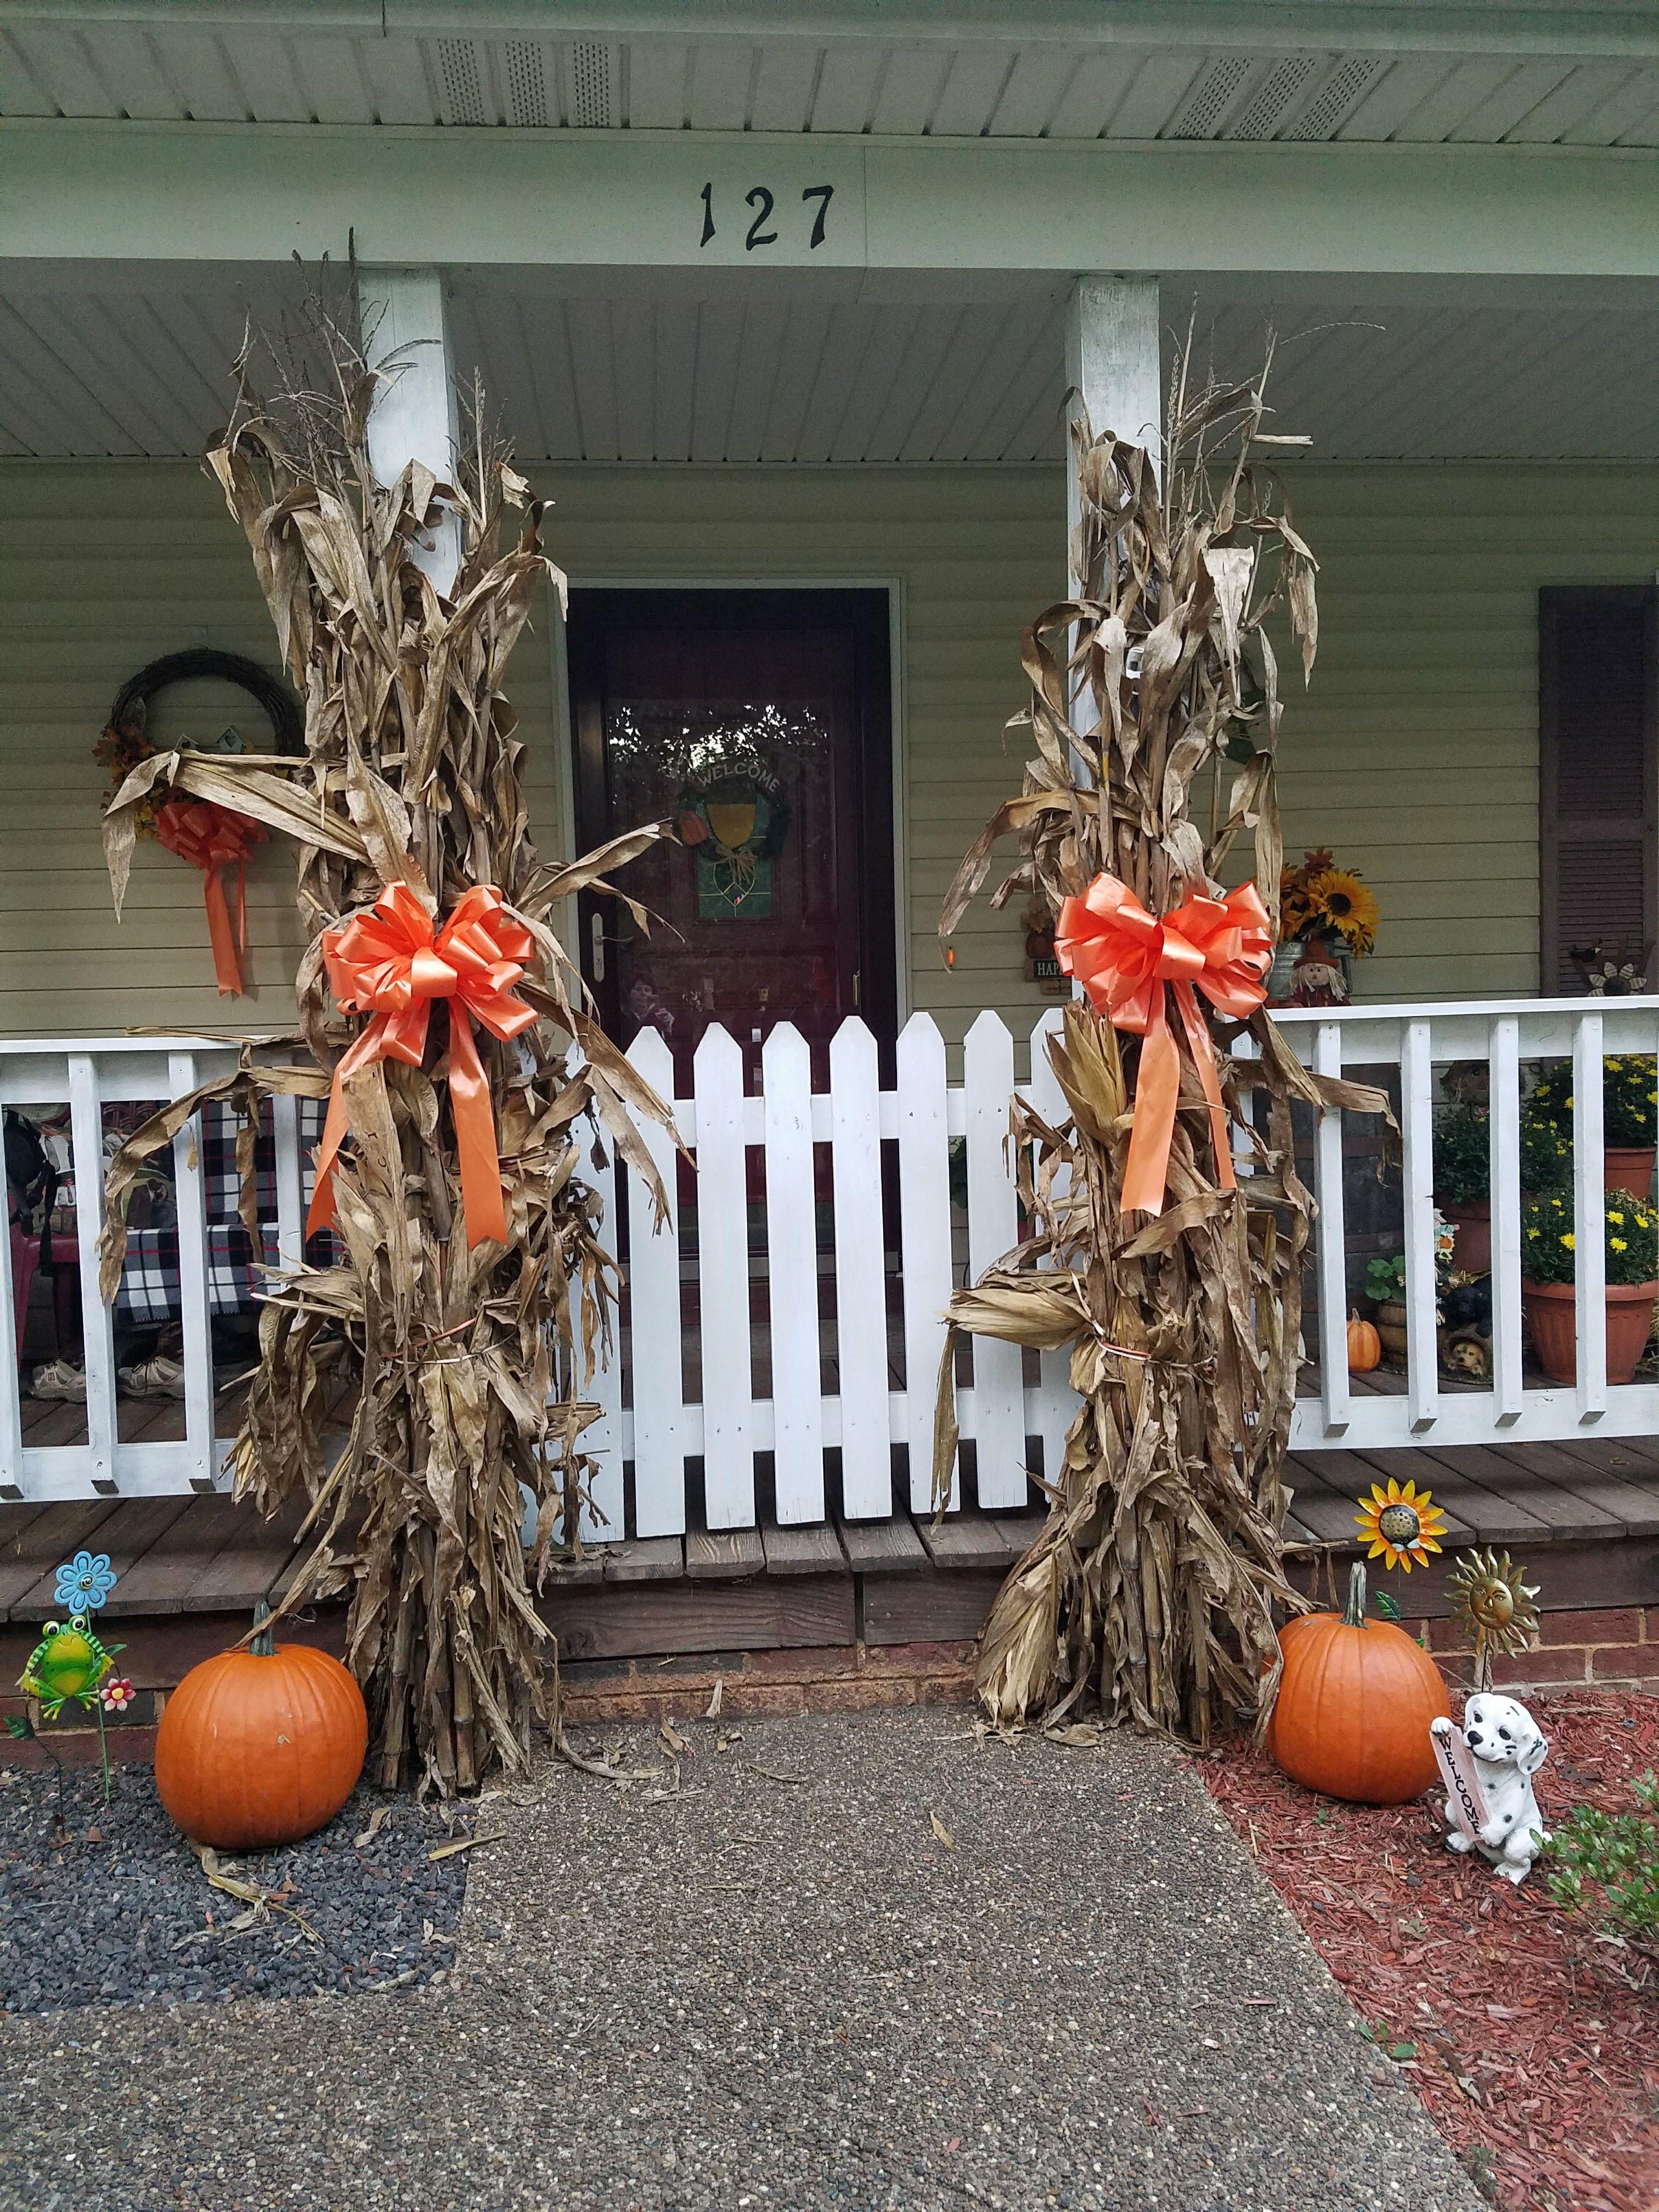 Cornstalks and pumpkins on our front porch 2016 #fallfrontporchdecor